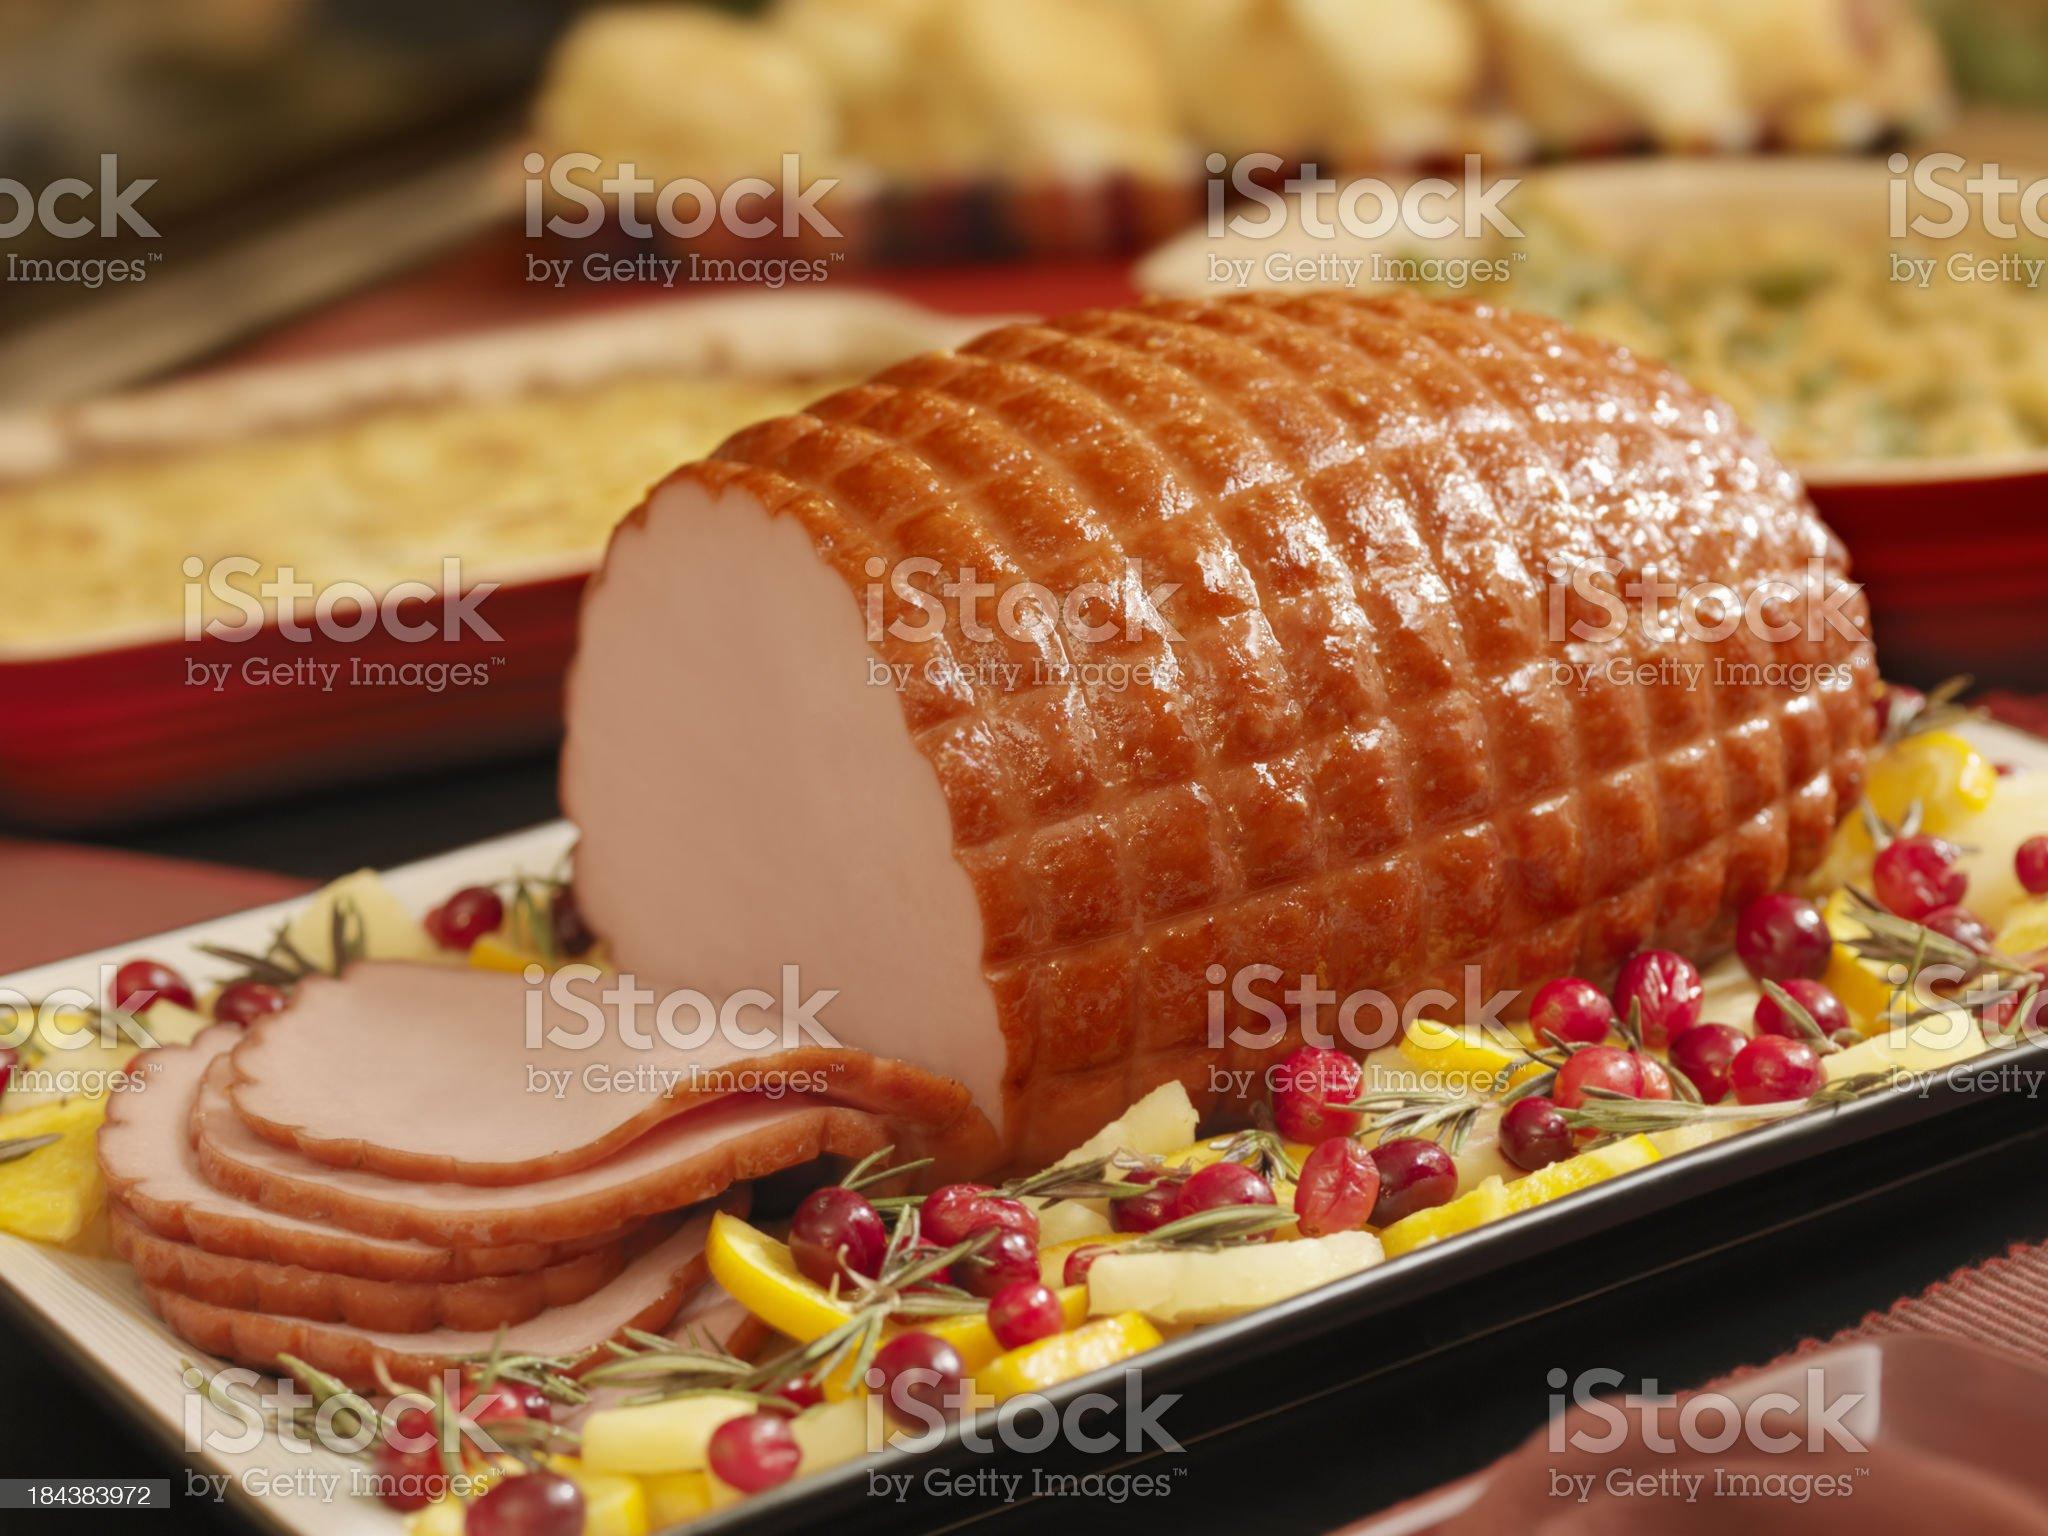 Glazed Ham Dinner royalty-free stock photo